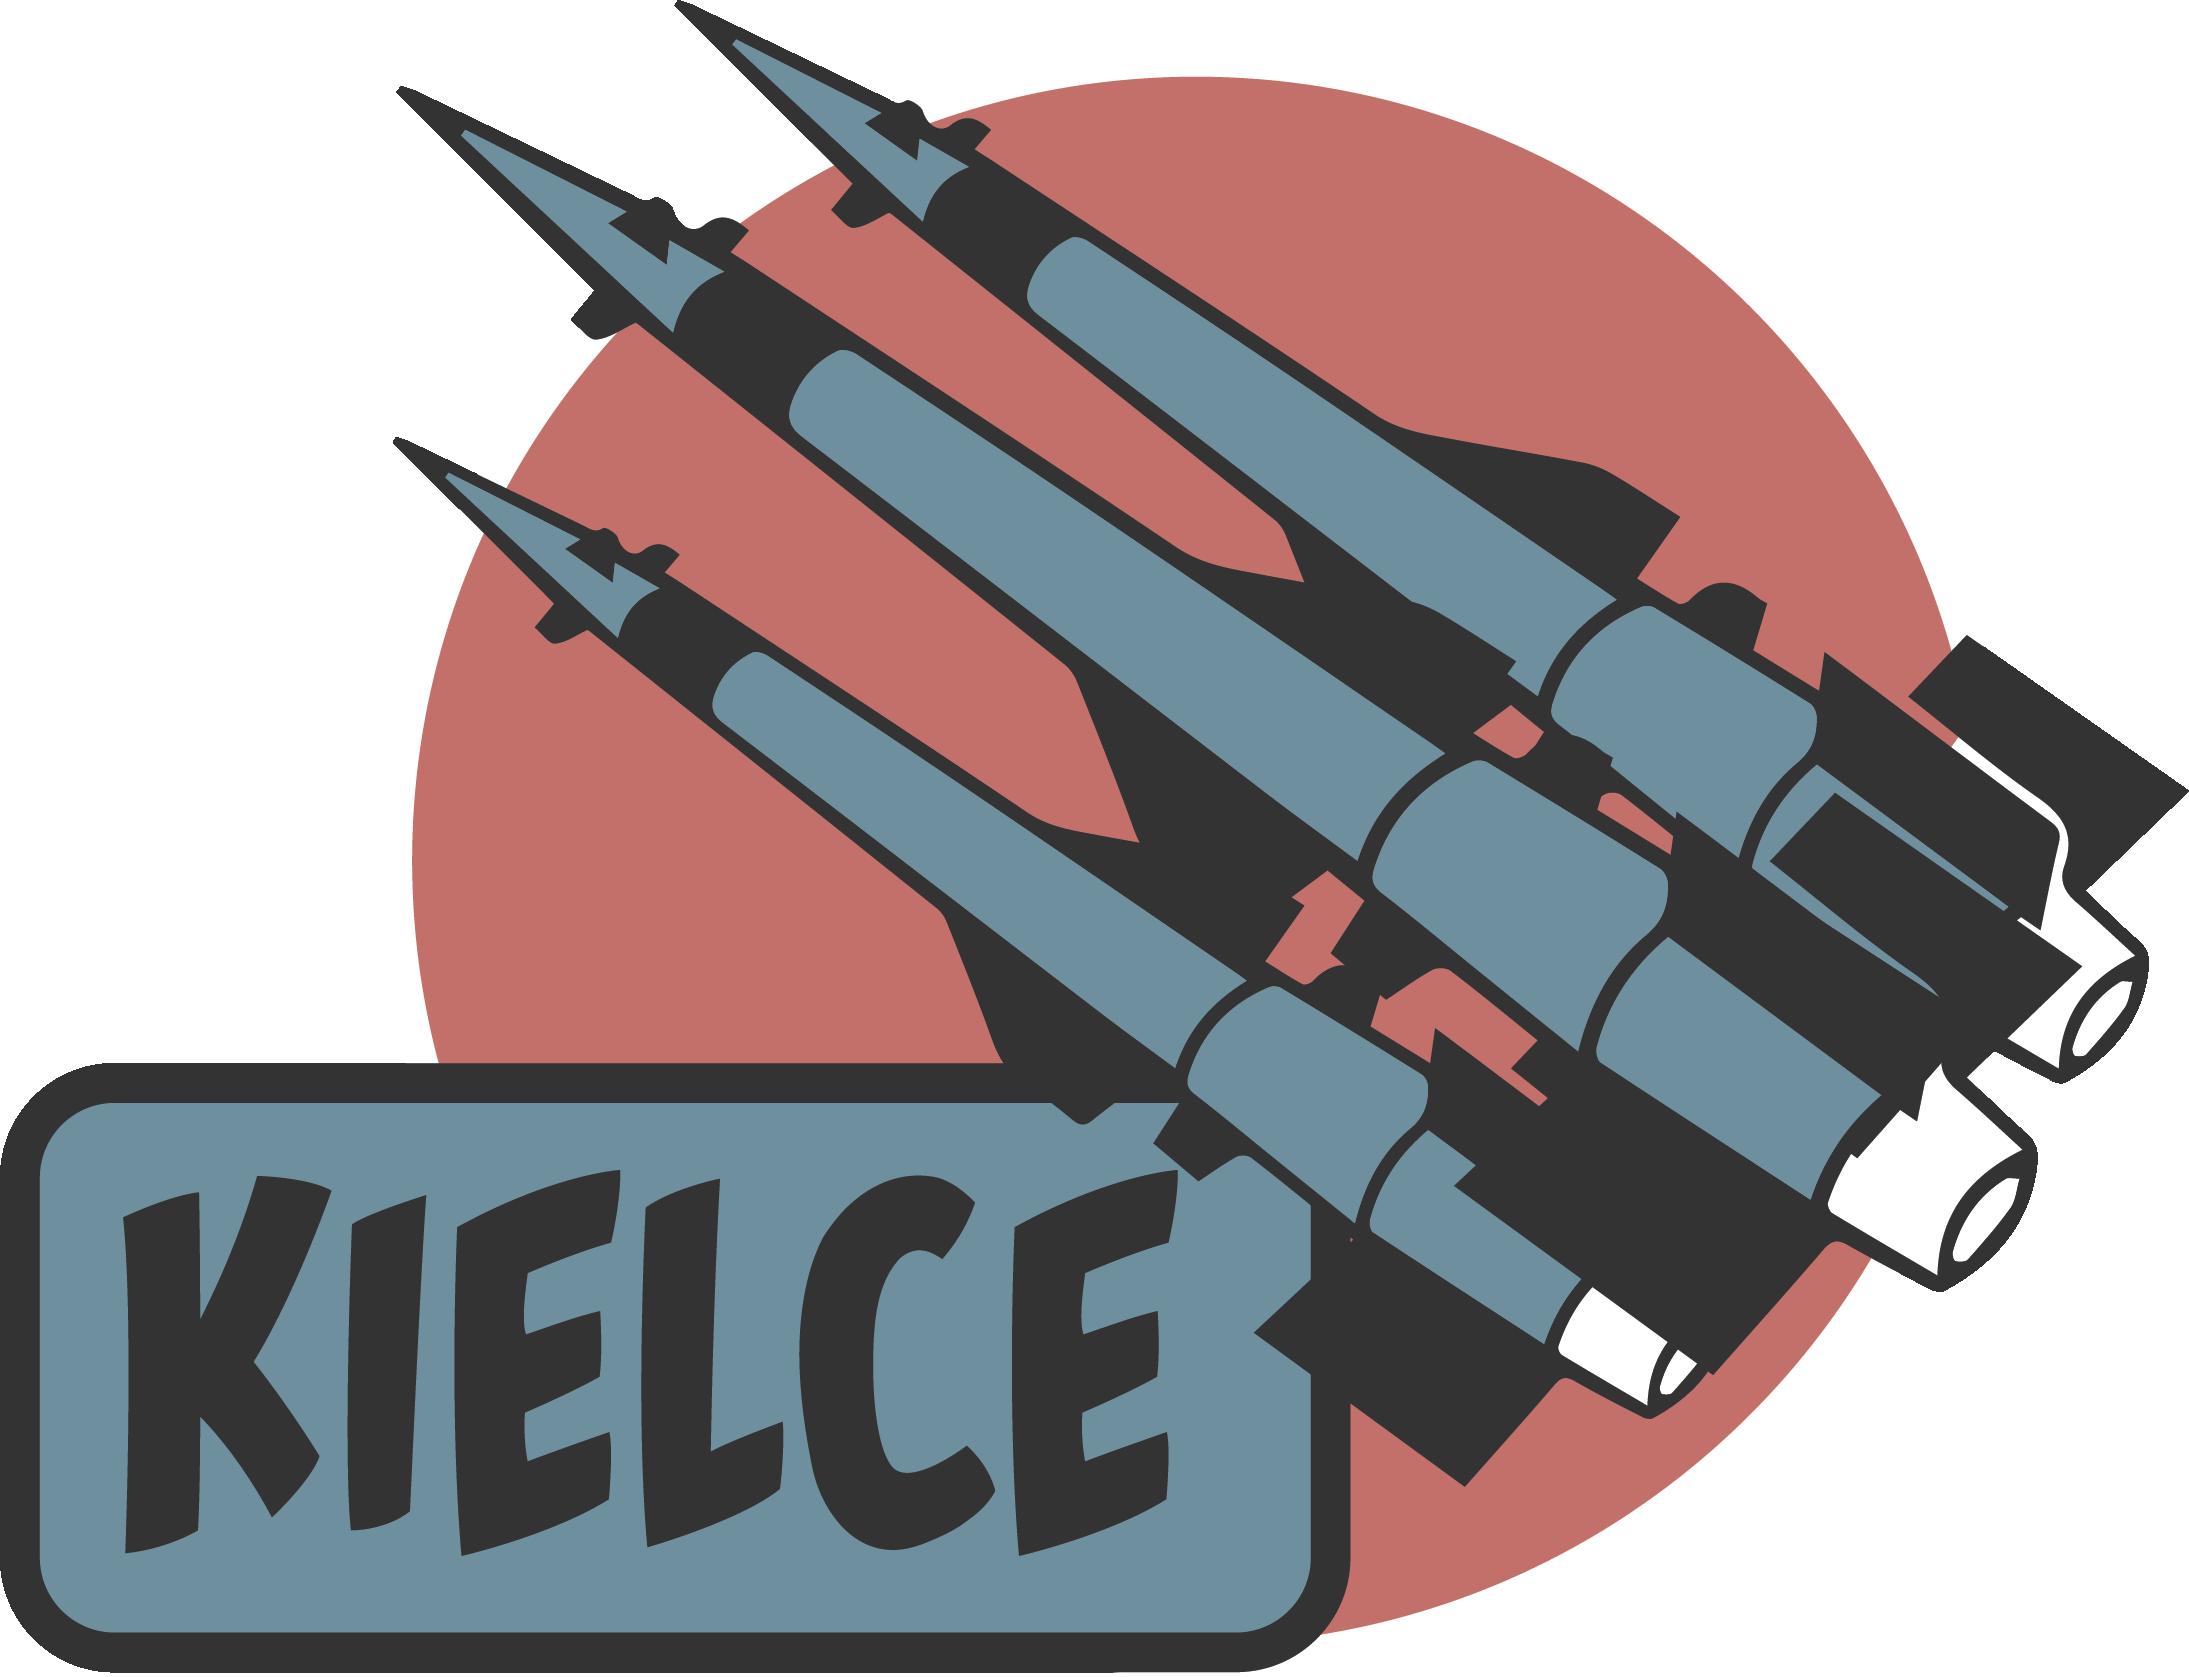 Kielce-2